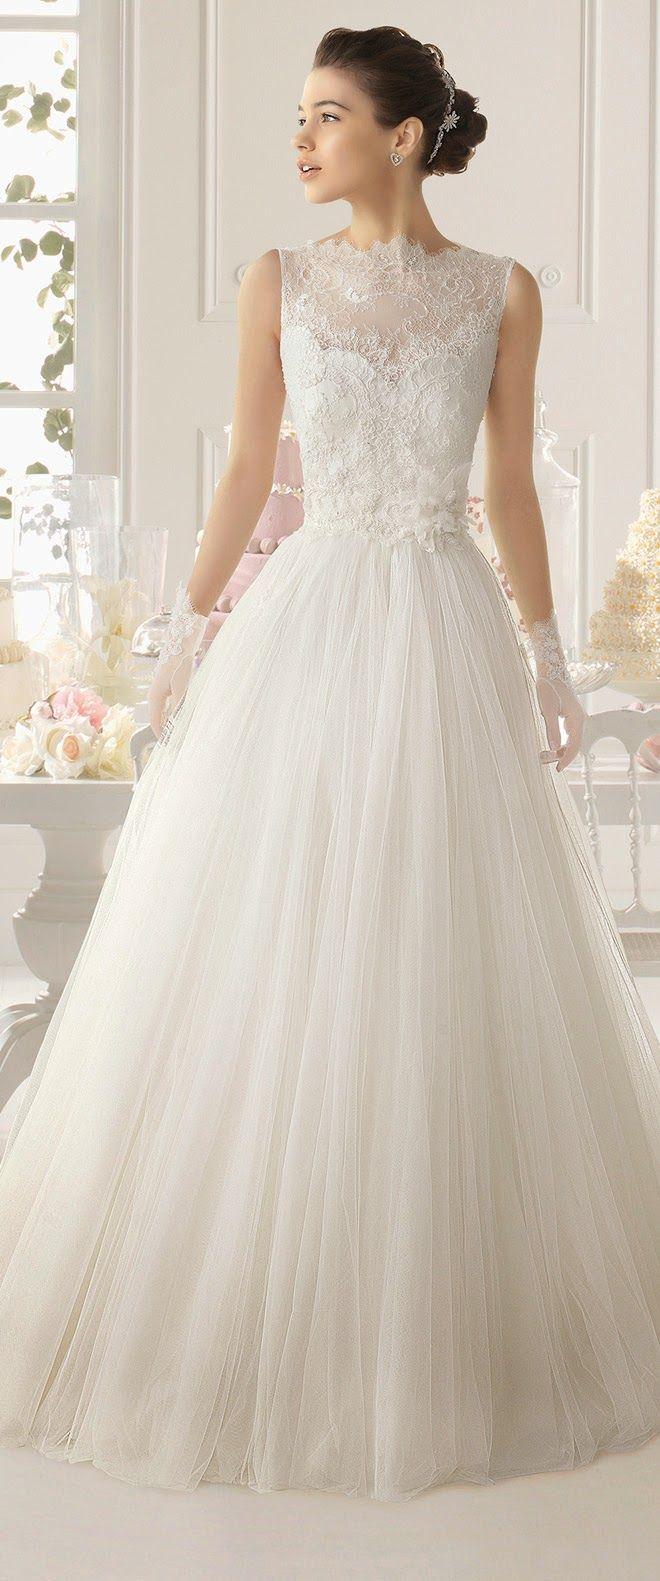 Wedding-Dresses-0533